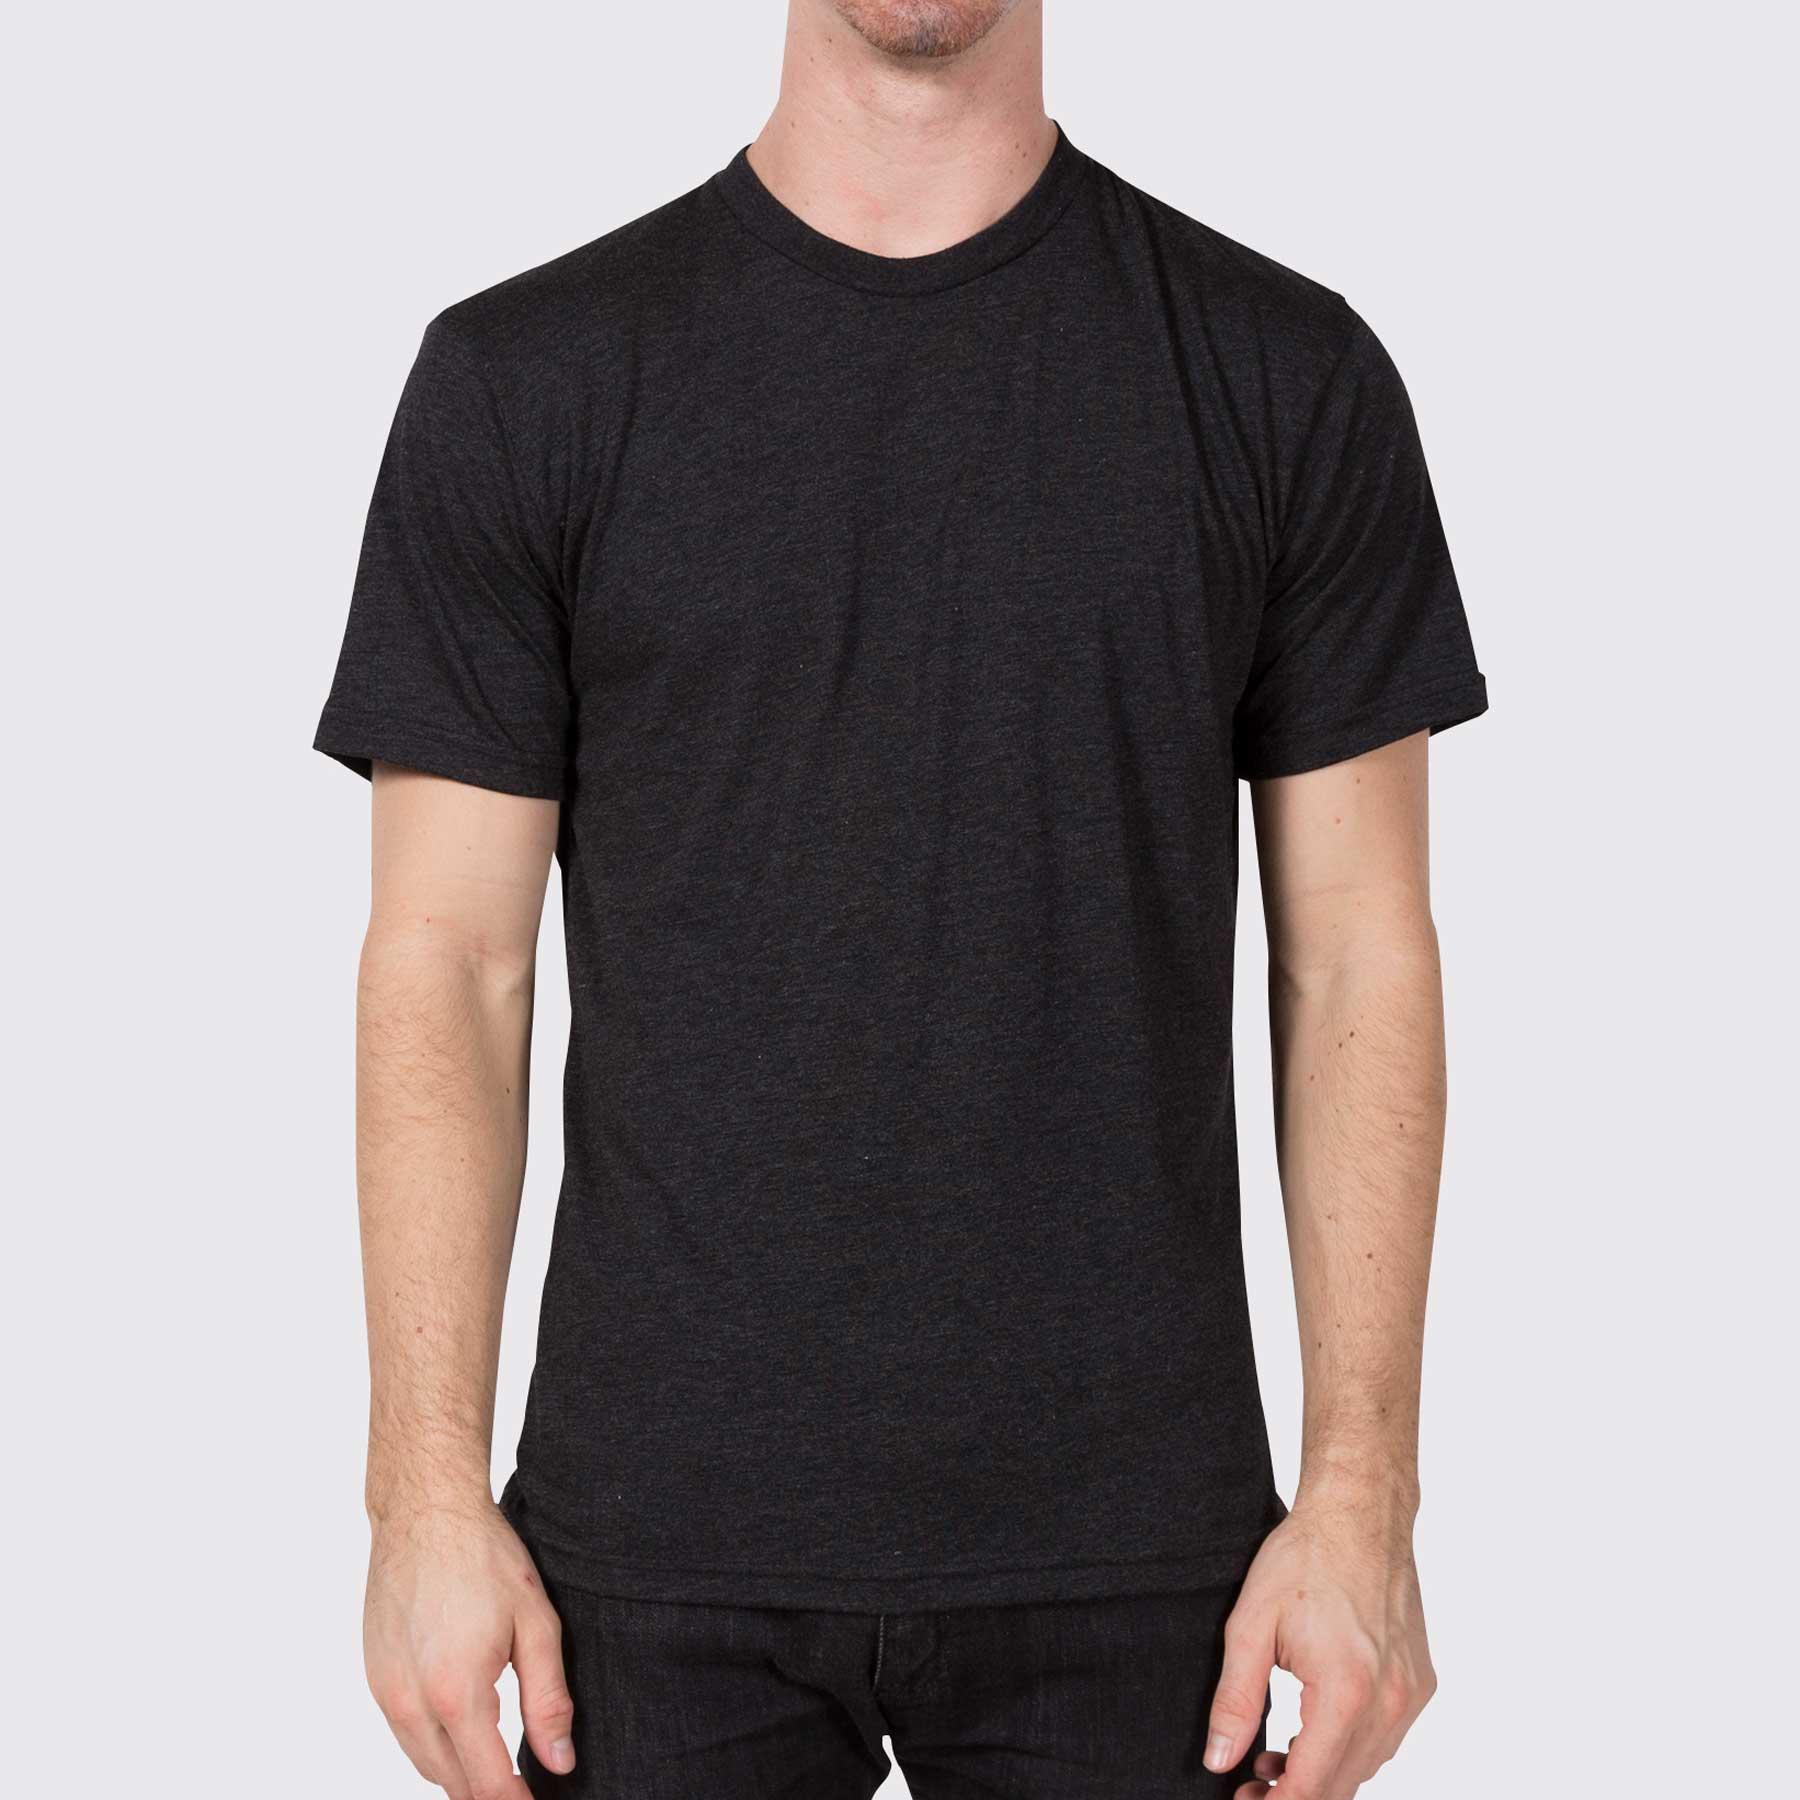 0adb3d8dc Next Level Apparel 6010 Tri-Blend | Custom Crew Neck Shirts